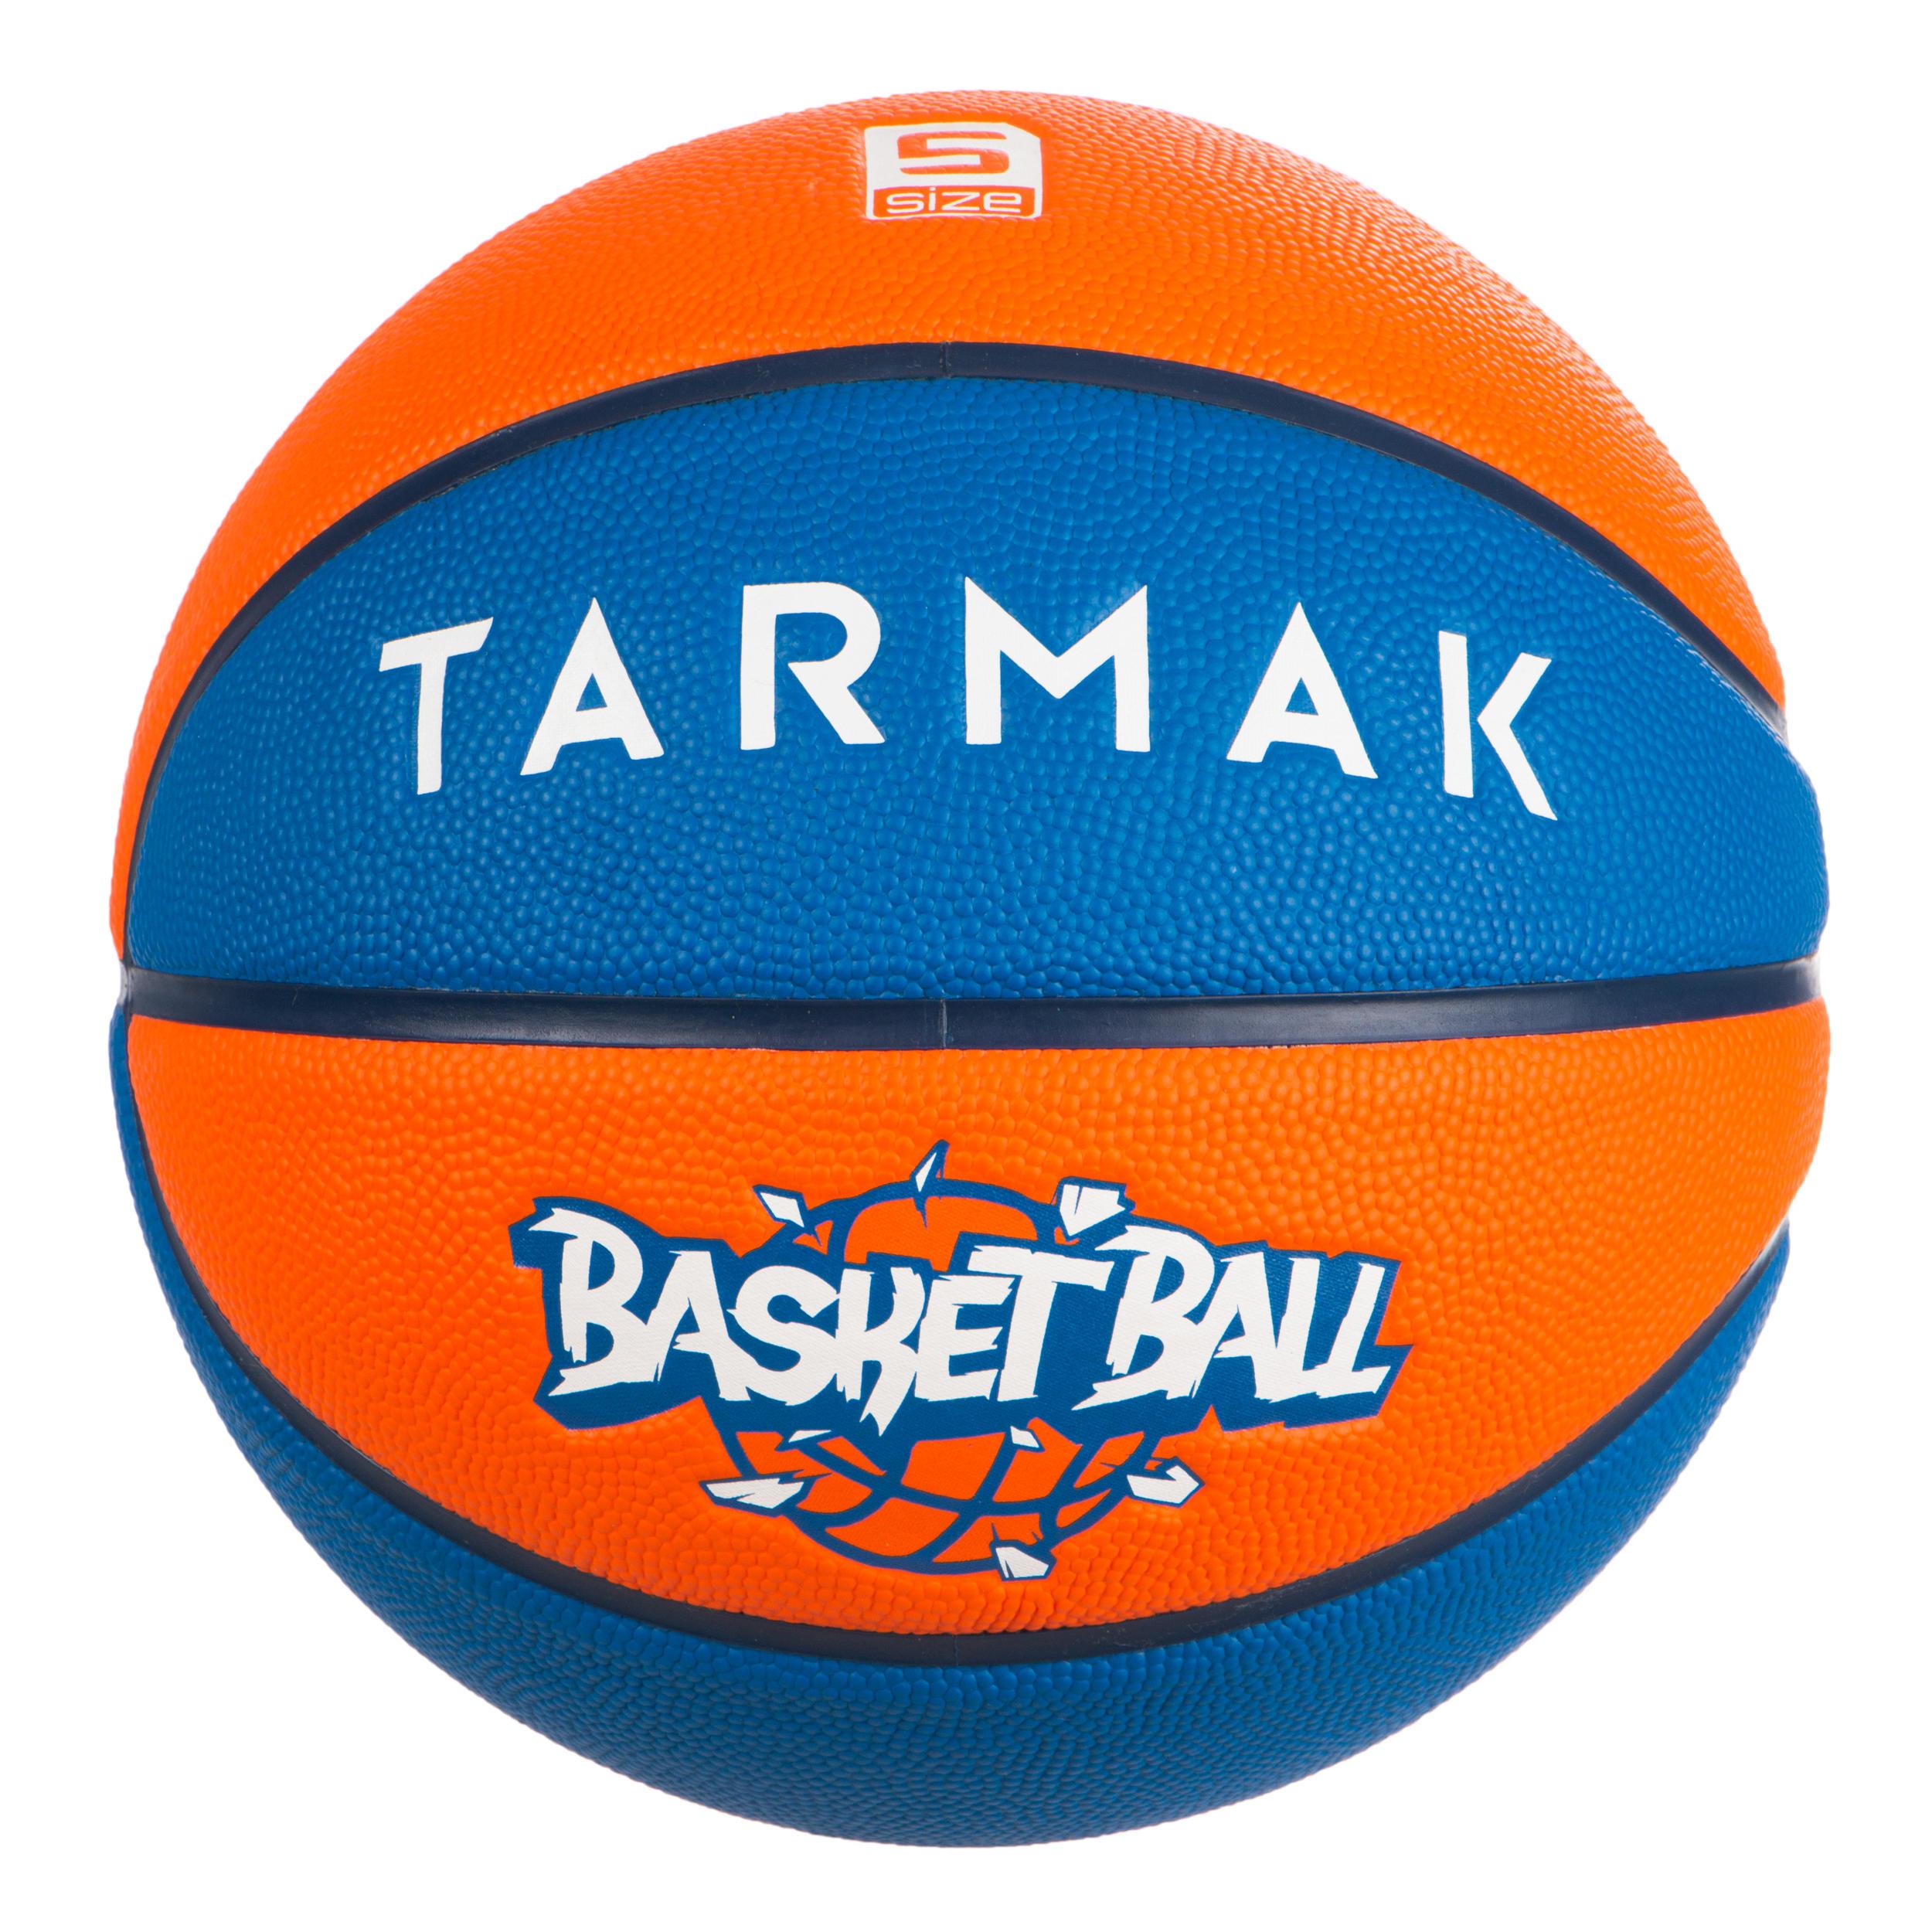 Basketball Wizzy Wappen Größe 5 Kinder Tarmak Decathlon